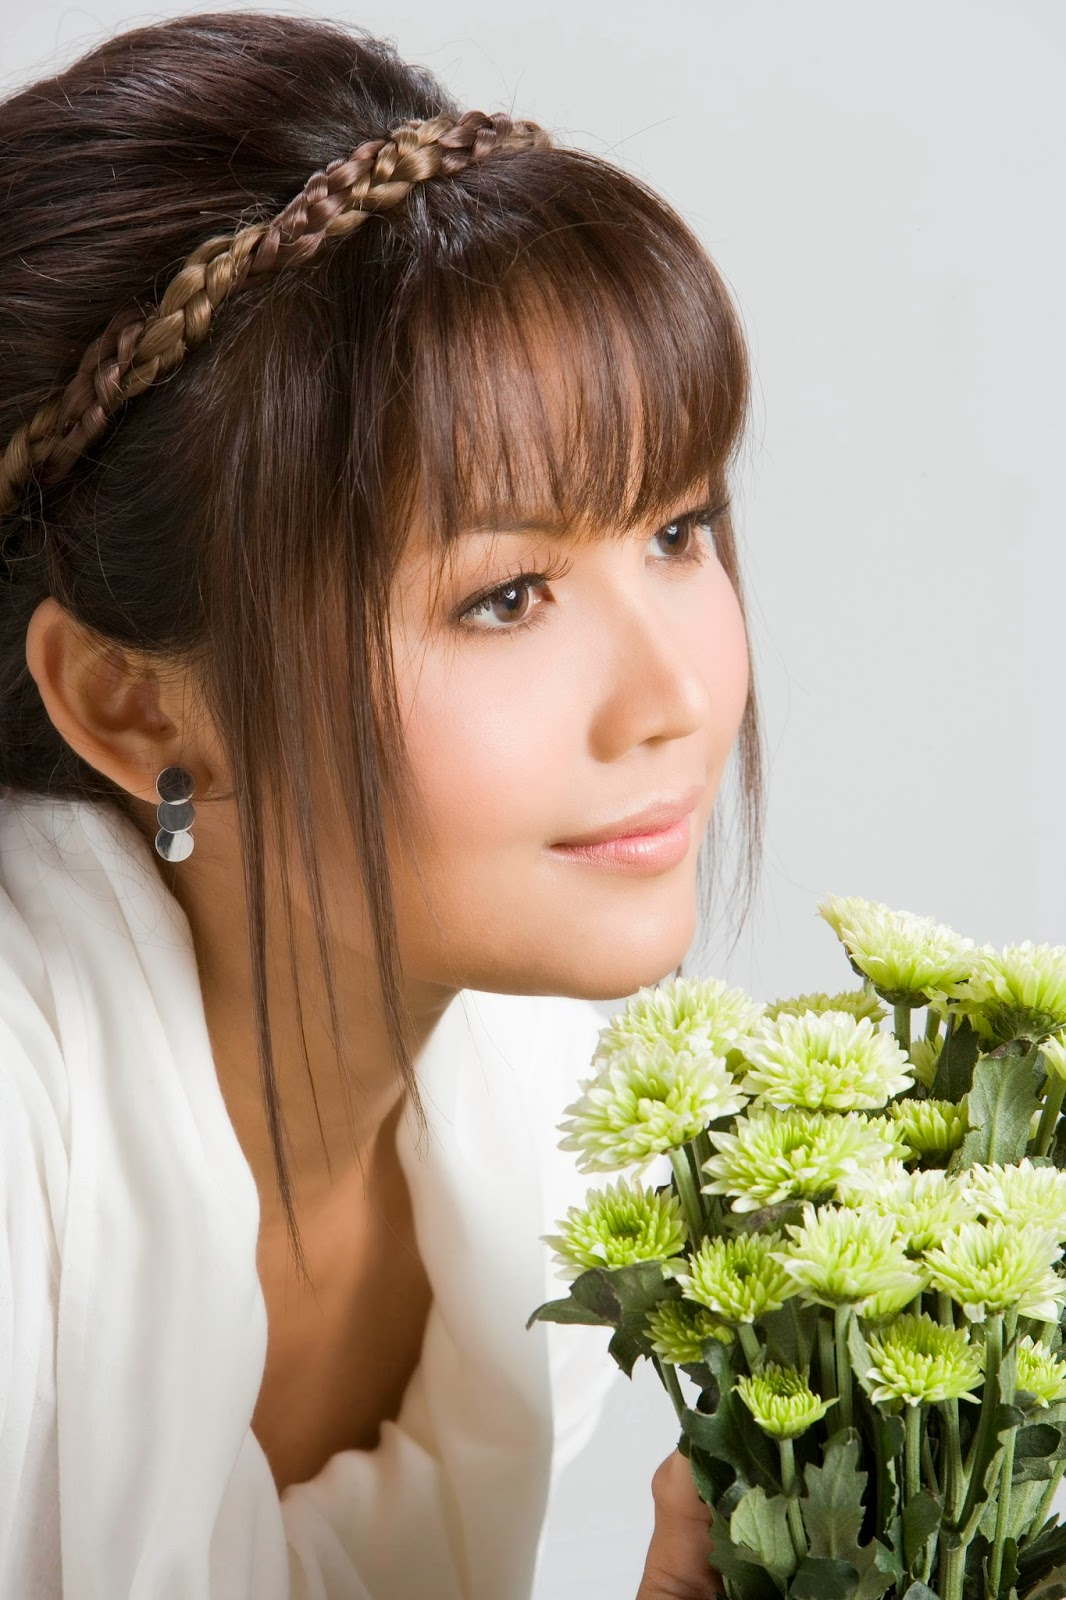 Download [Mp3]-[Album] รวมเพลงของ ตั๊กแตน ชลดา นักร้องเสียงคุณภาพ ทั้ง 8 อัลบั้ม @@320kbps 4shared By Pleng-mun.com